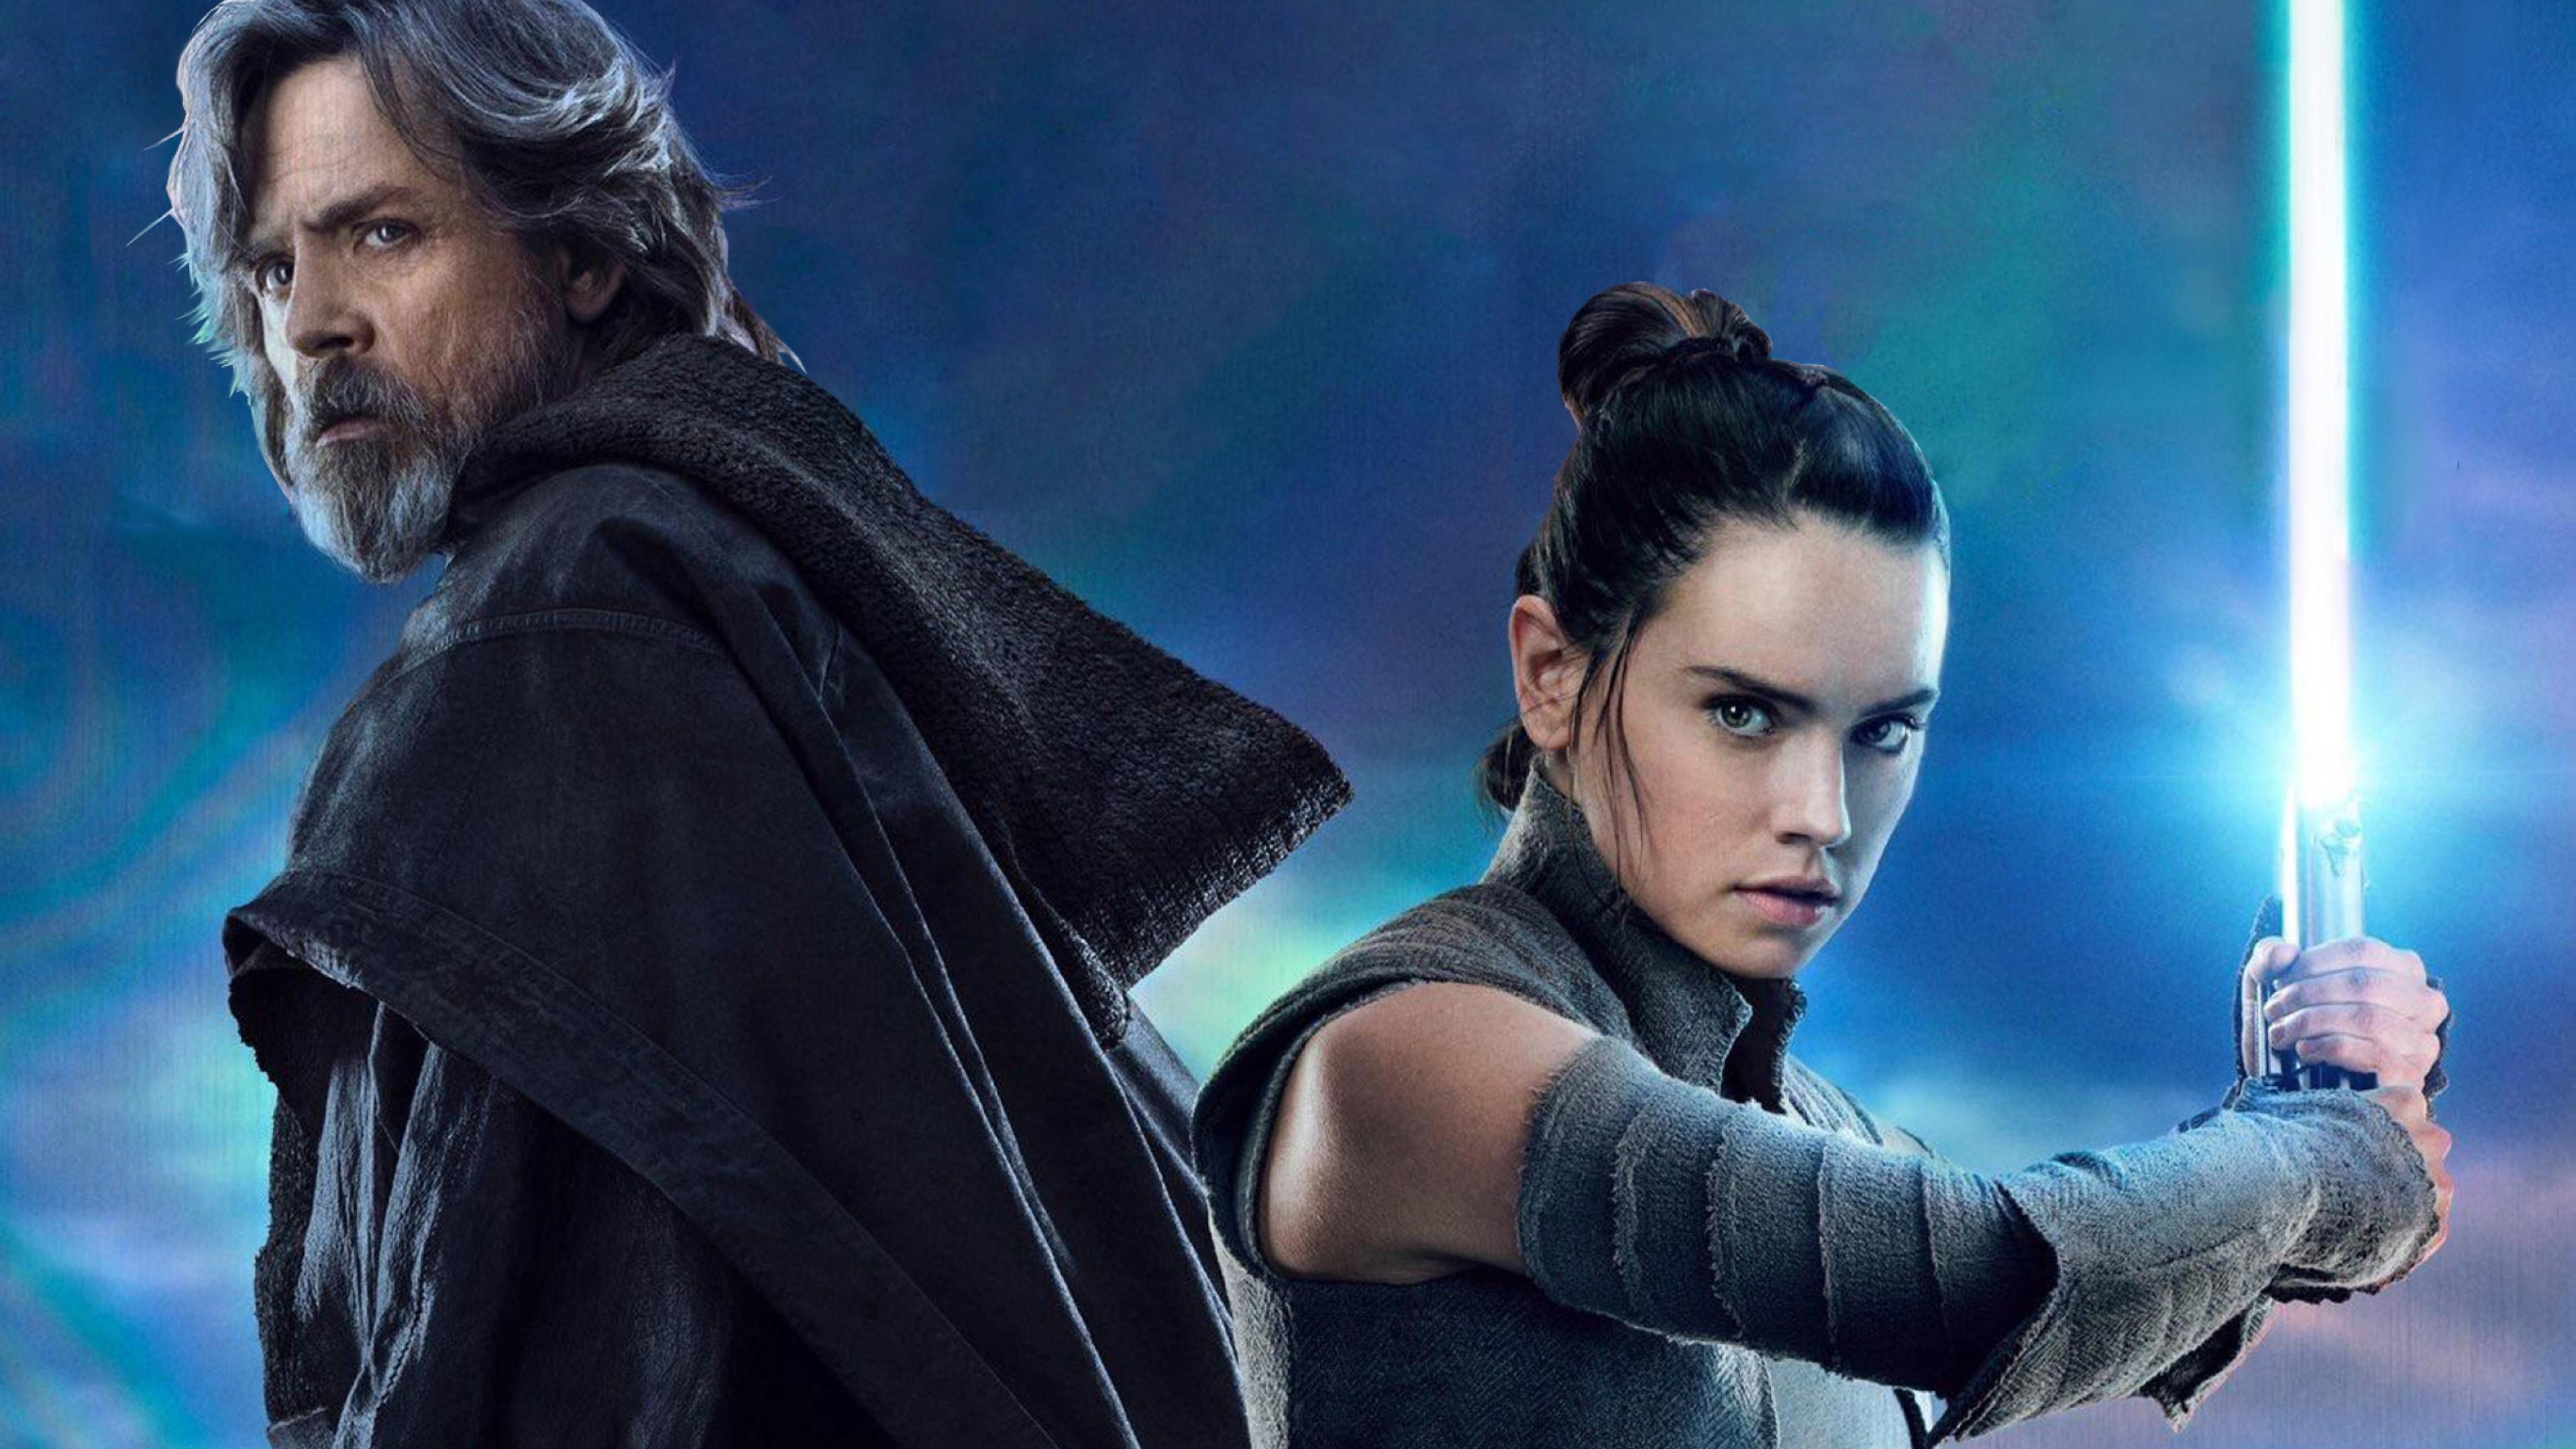 Rey And Luke Star Wars The Last Jedi, Full HD 2K Wallpaper